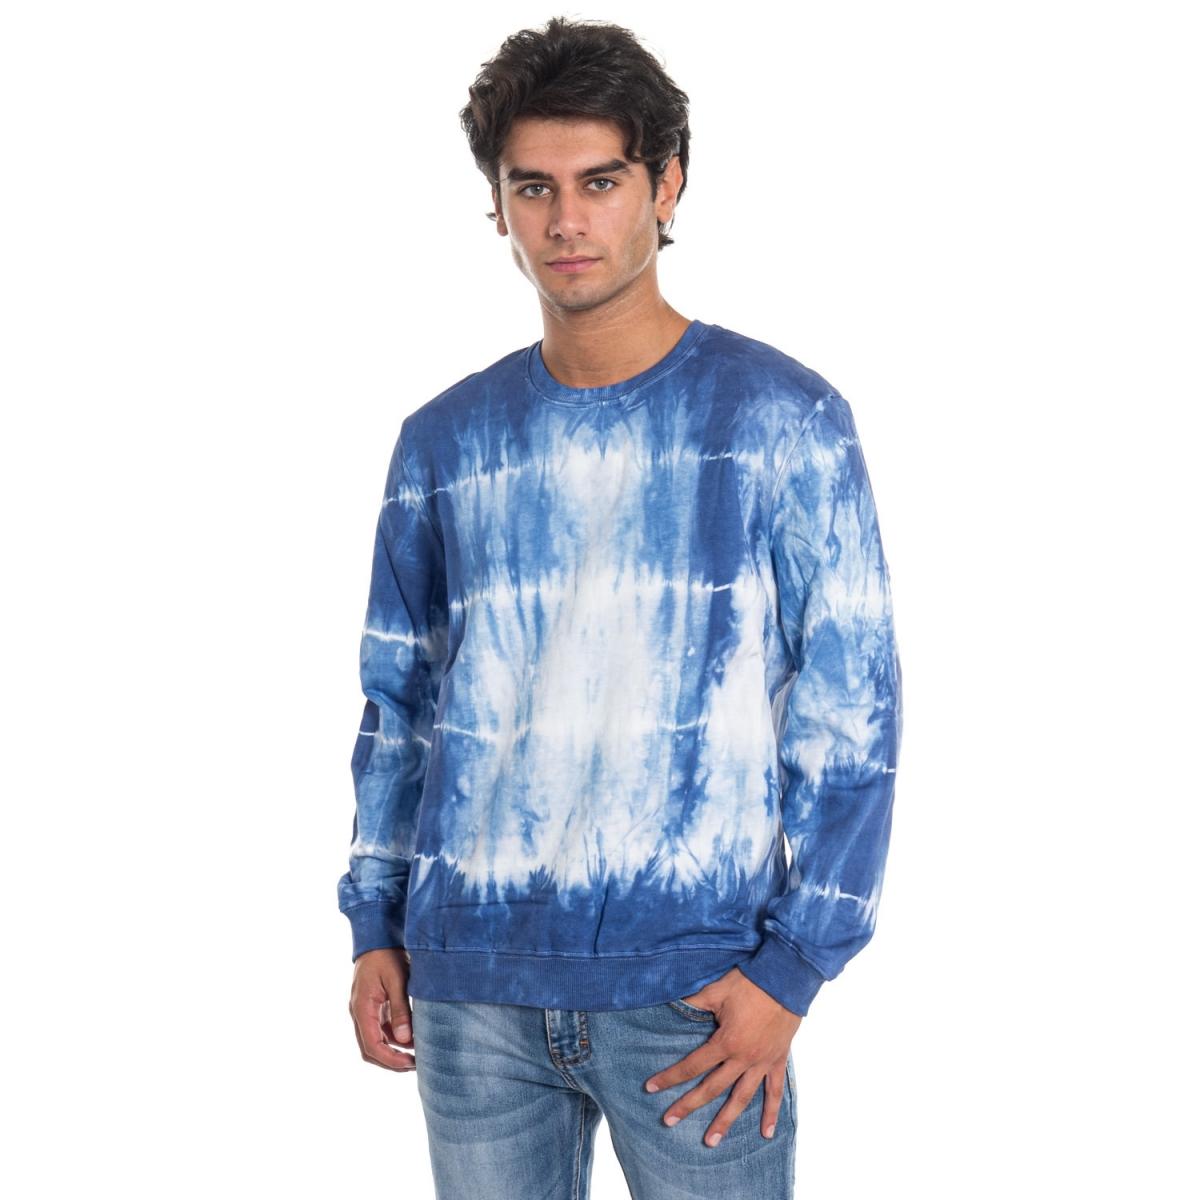 clothing Sweatshirts men Felpa NBB0001-5 LANDEK PARK Cafedelmar Shop